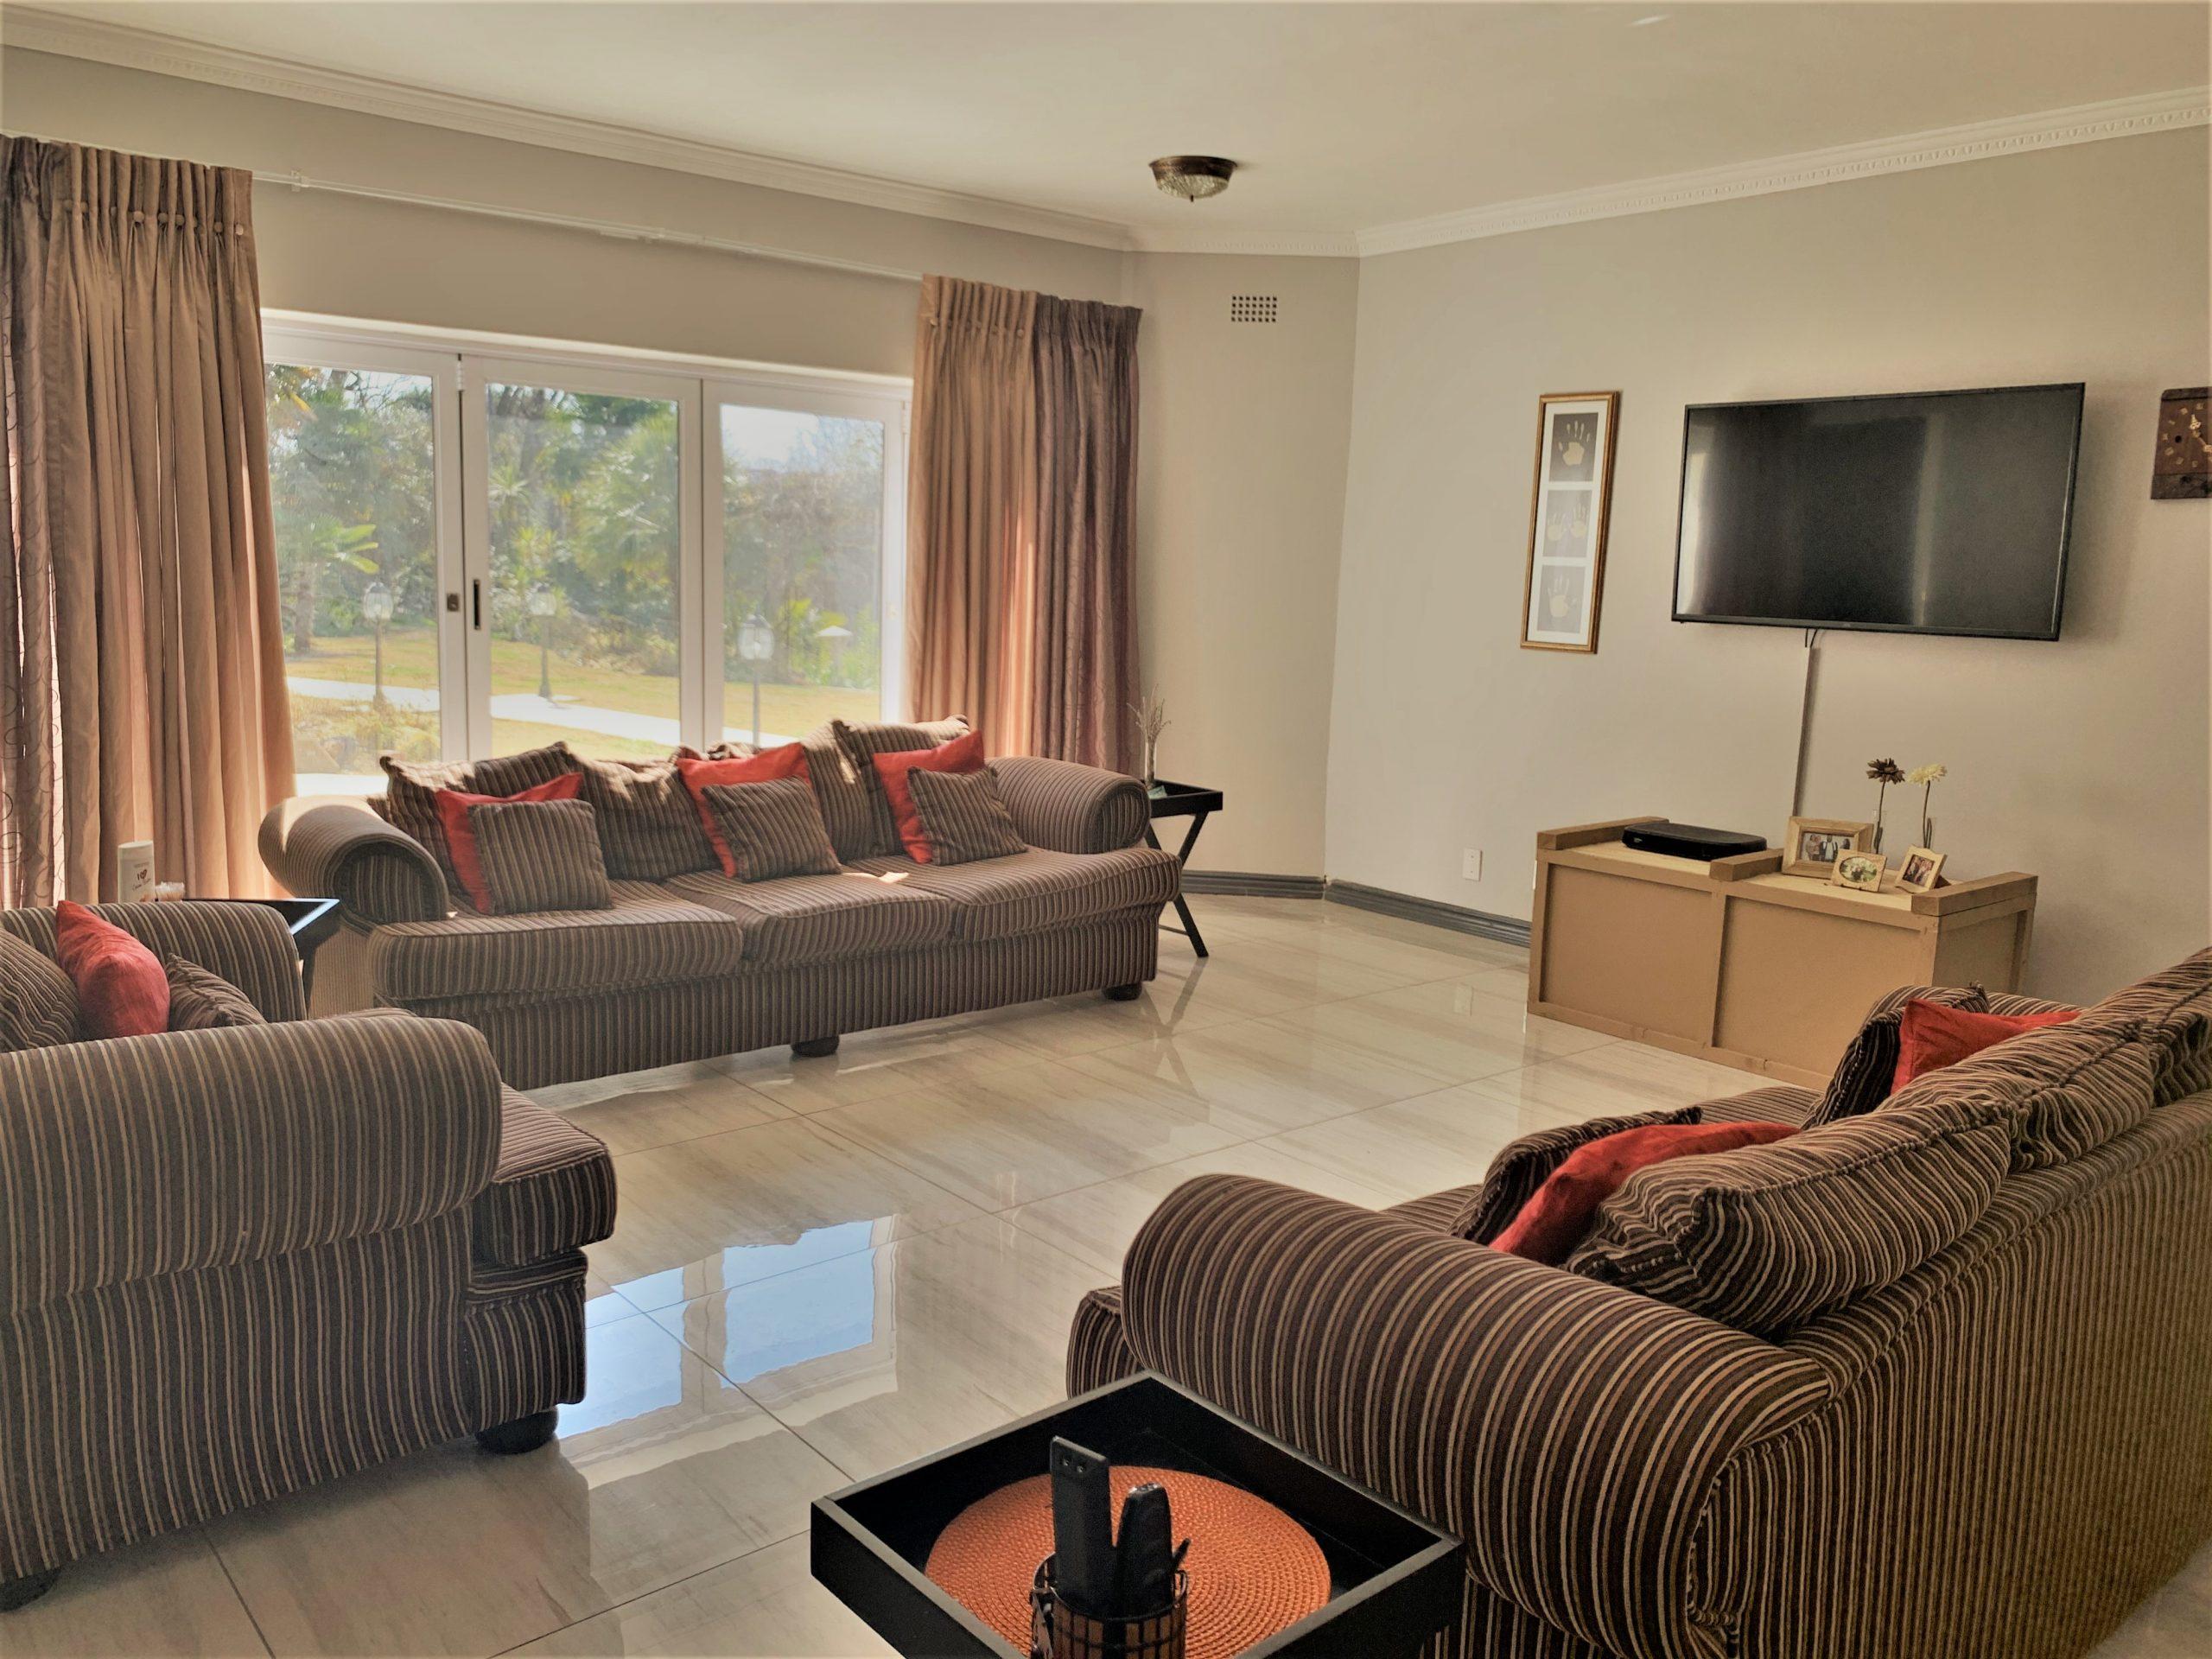 4 Bedroom House for Sale in Fochville